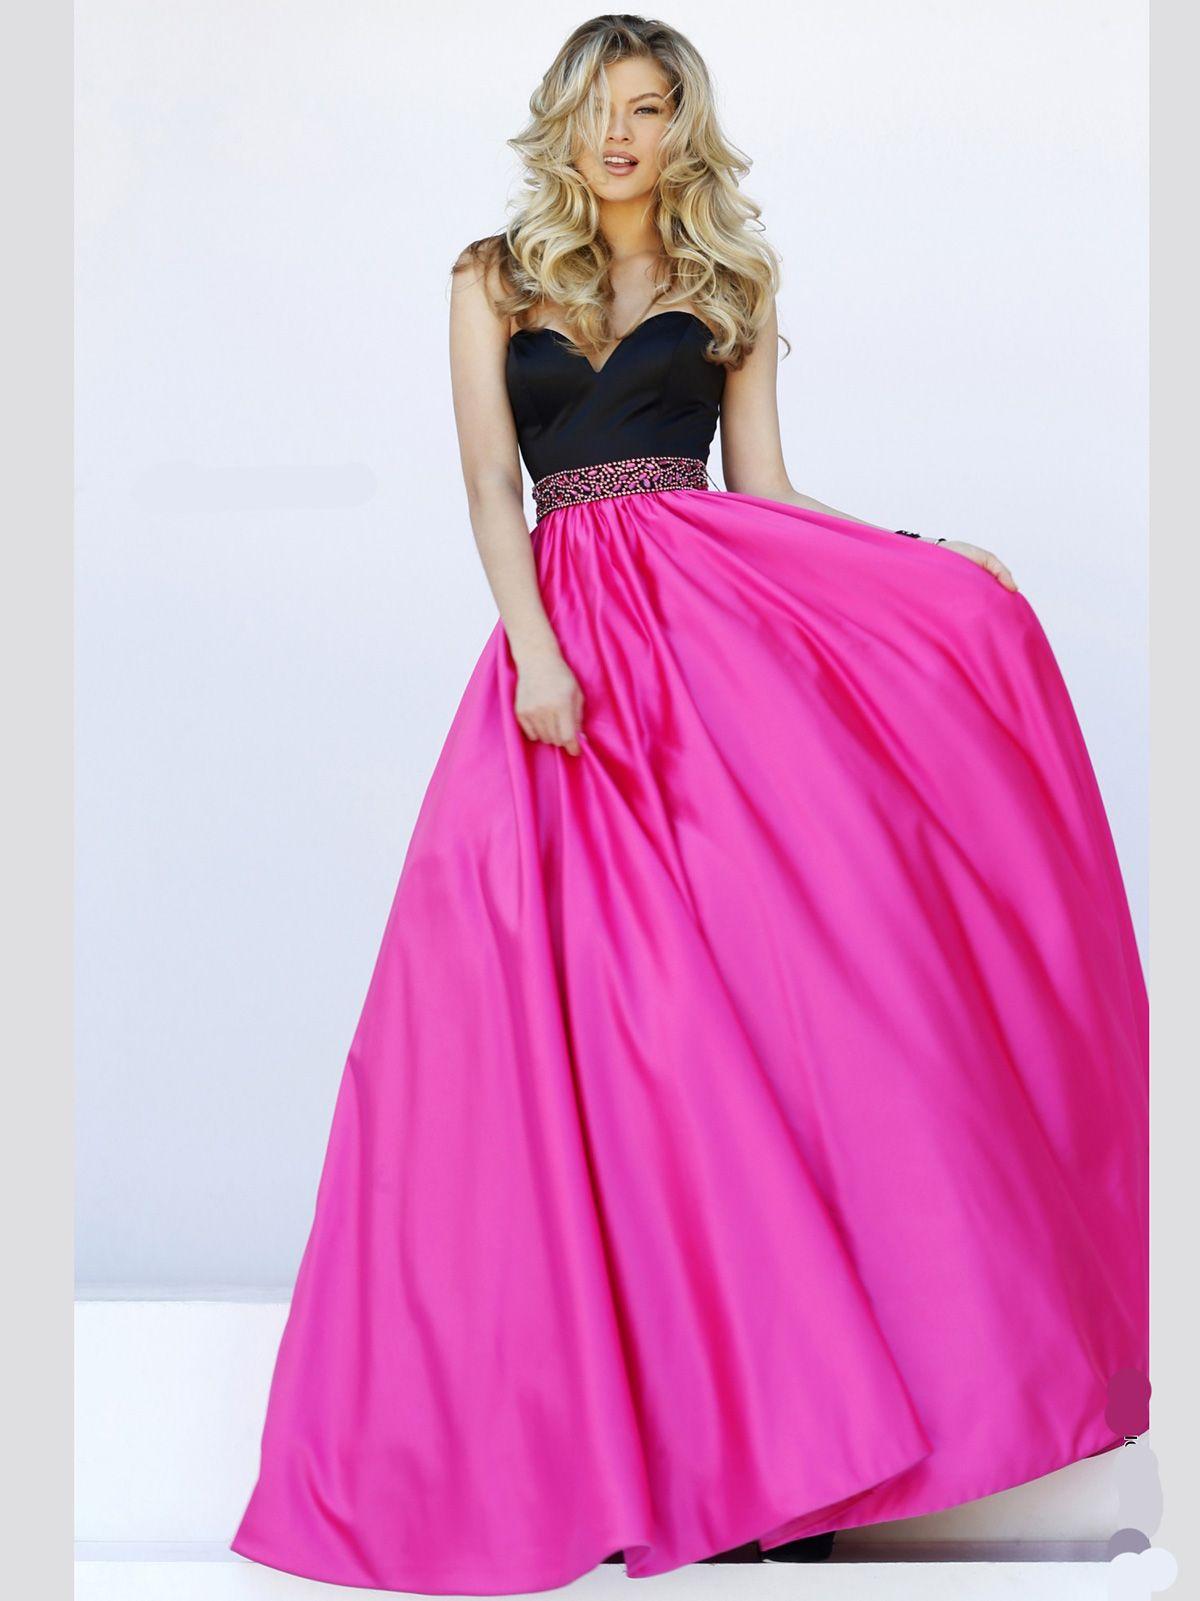 New Fashion Dresses at PromGirlGown: Long Sherri Hill 32324 Black Fuchsia  Sweetheart Prom Dress